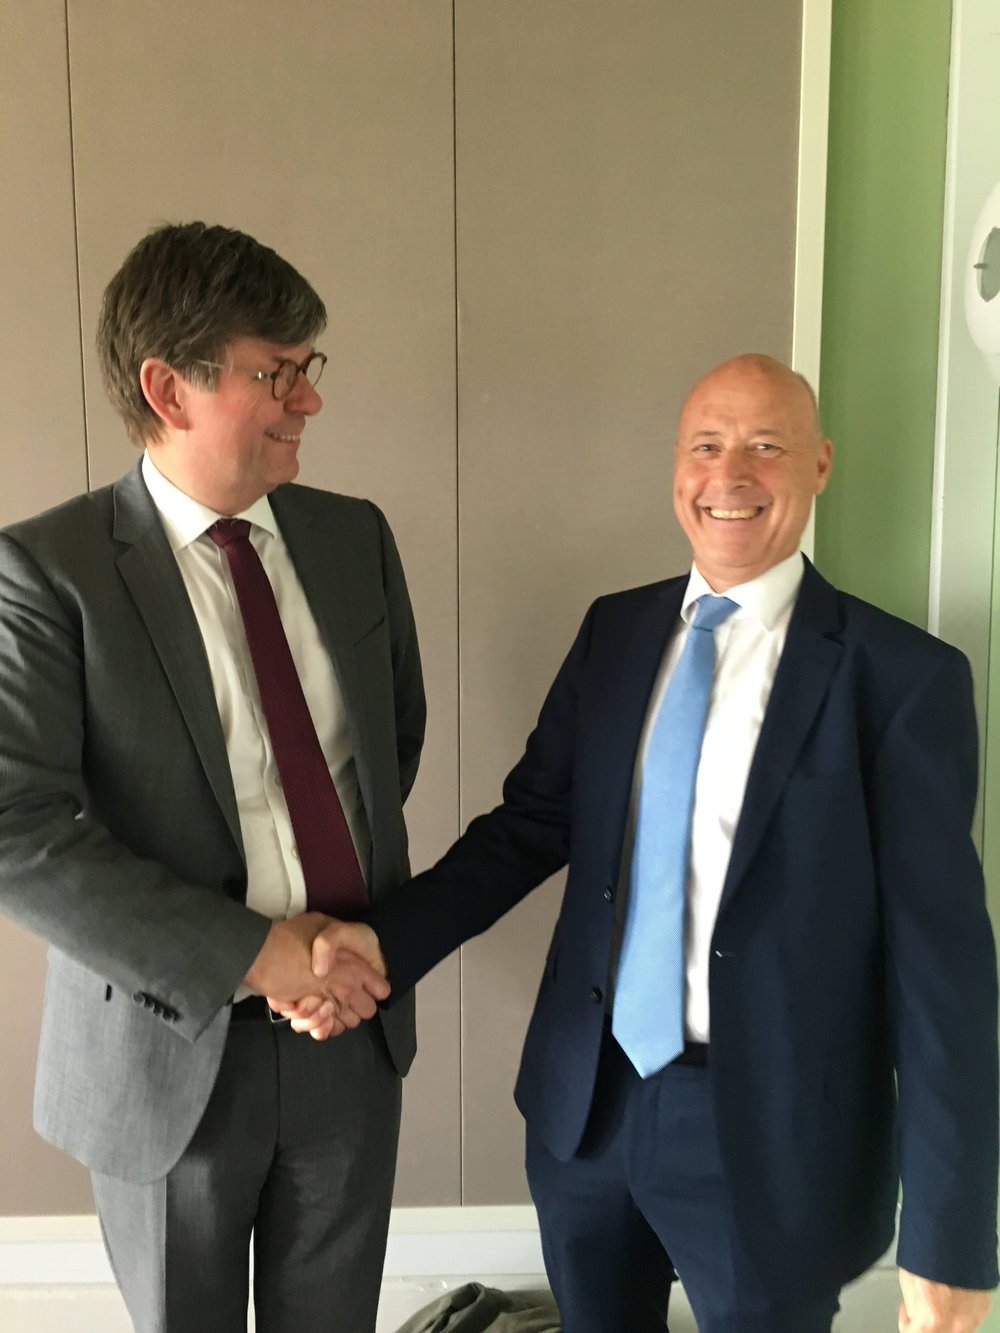 Michael Svane giver posten videre til TØFs nye formand Anders Hundahl